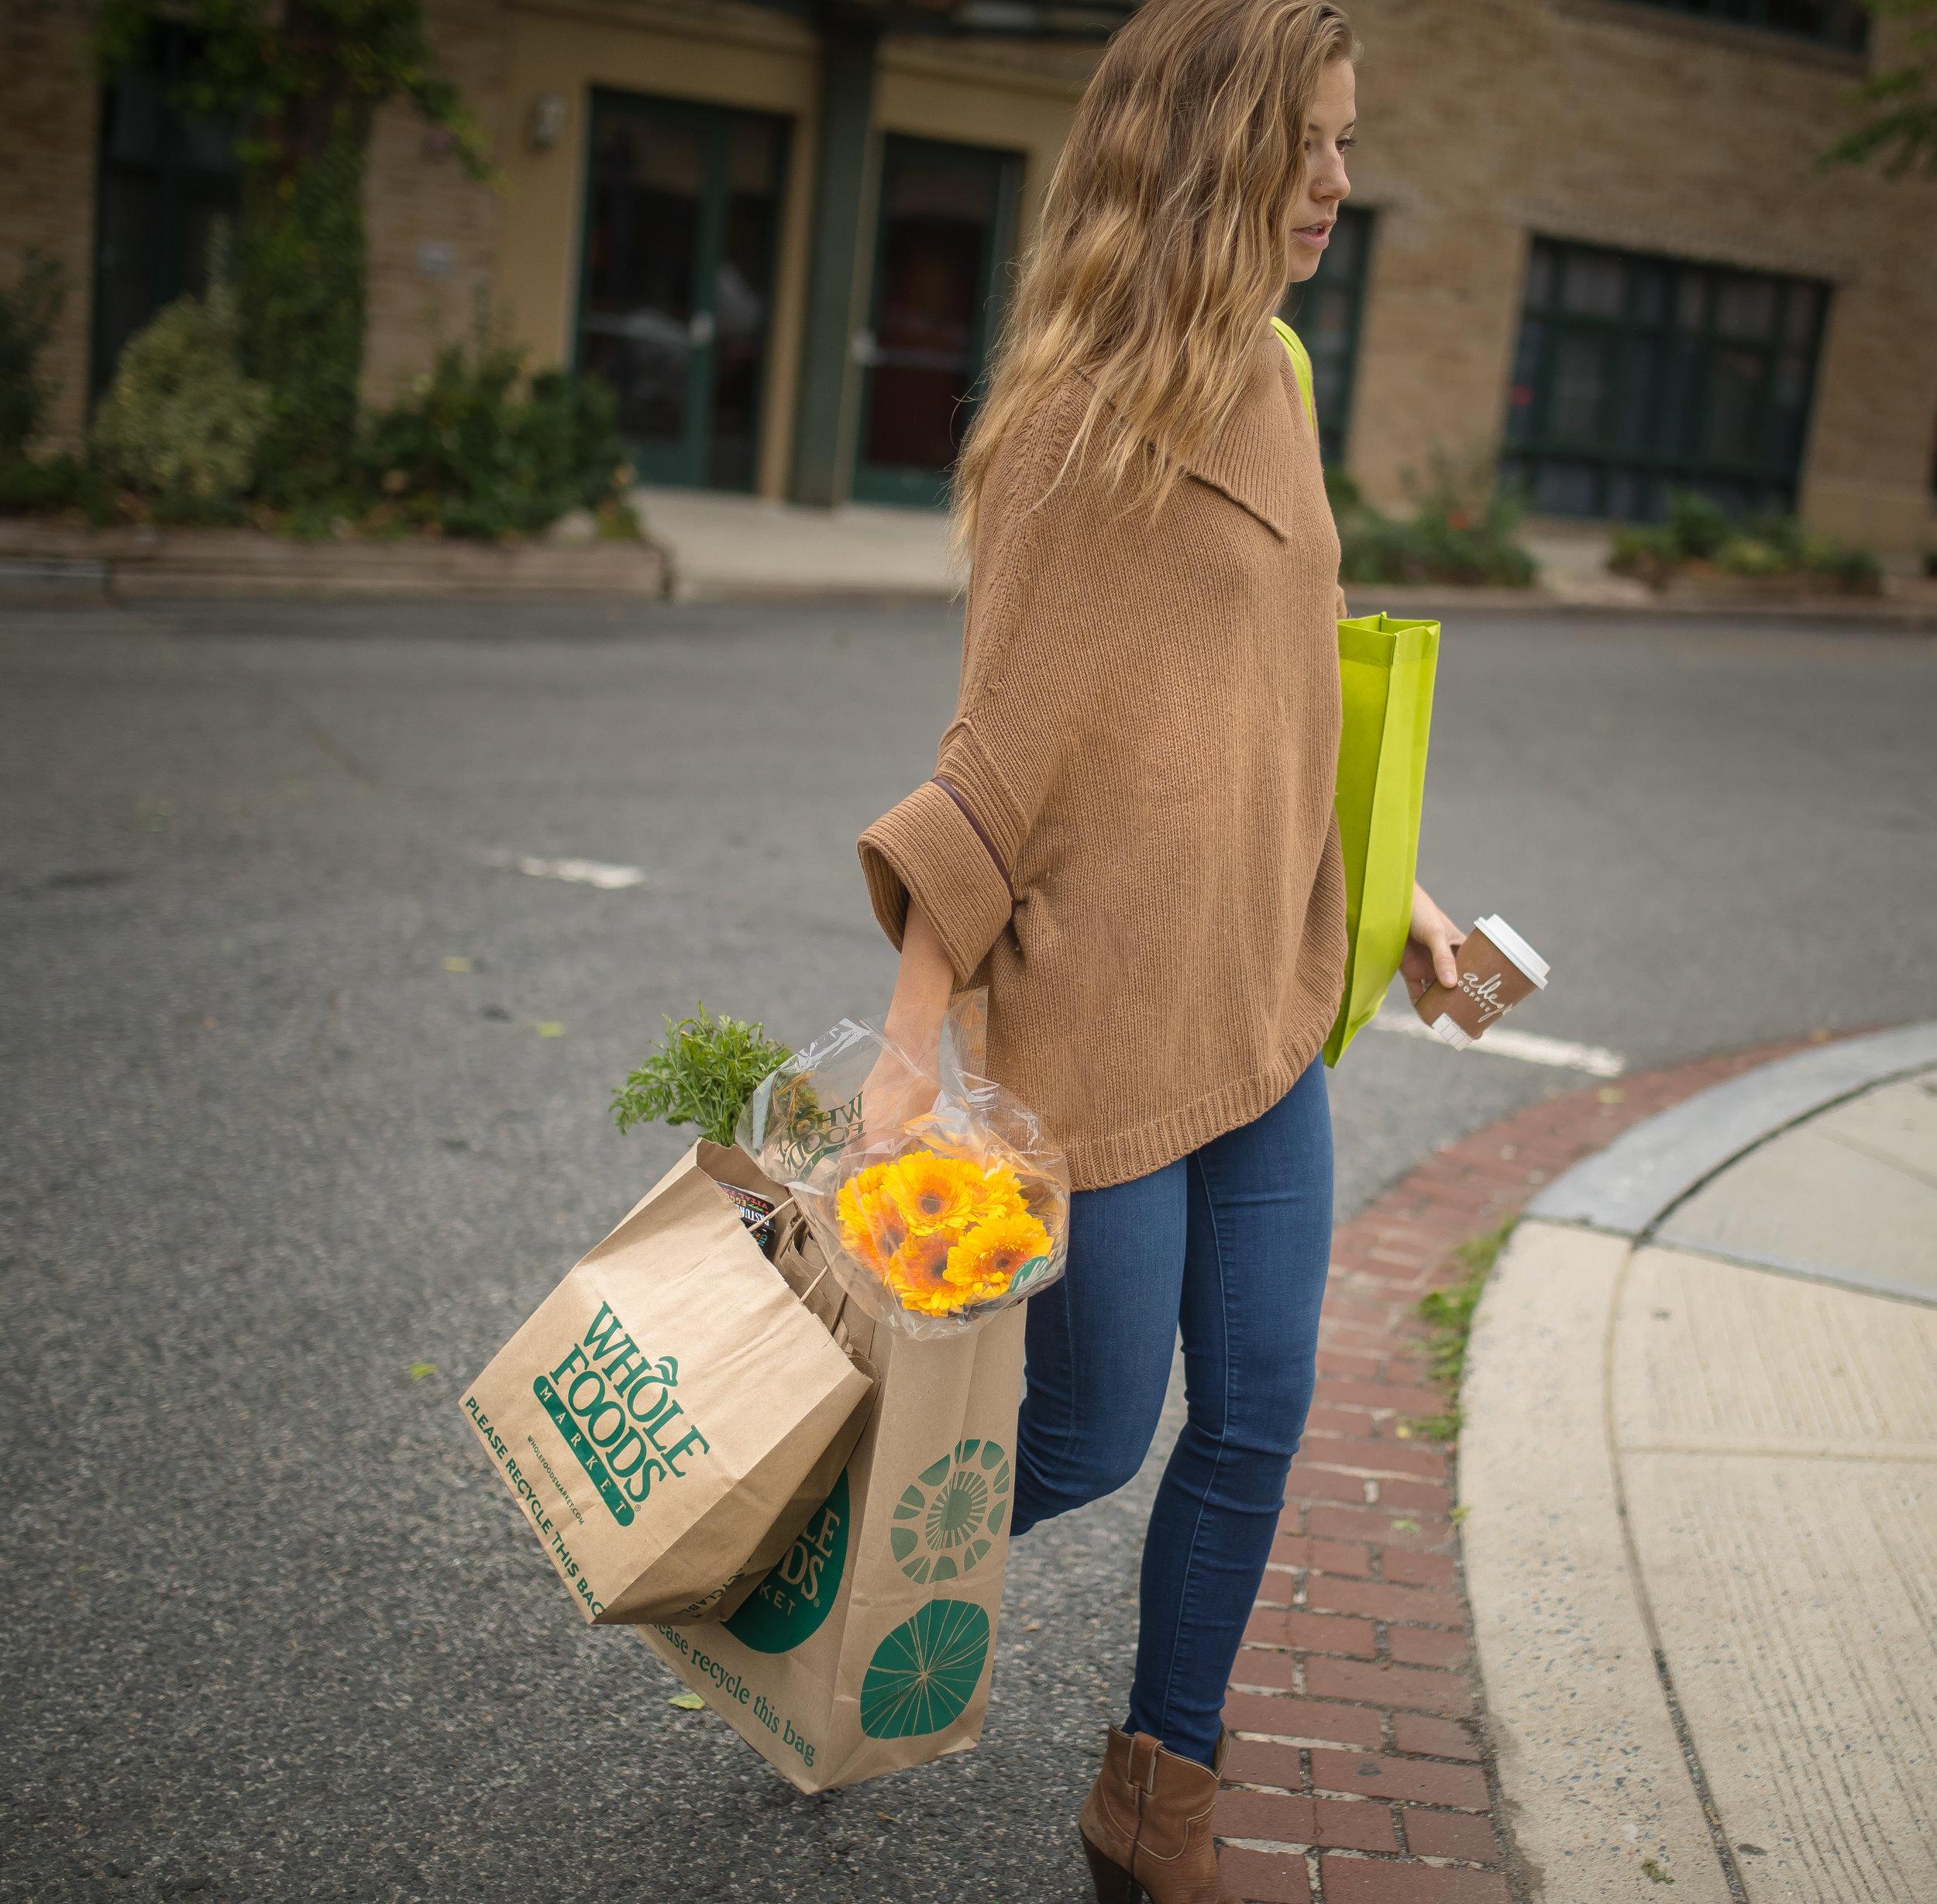 american_grocery_shopper